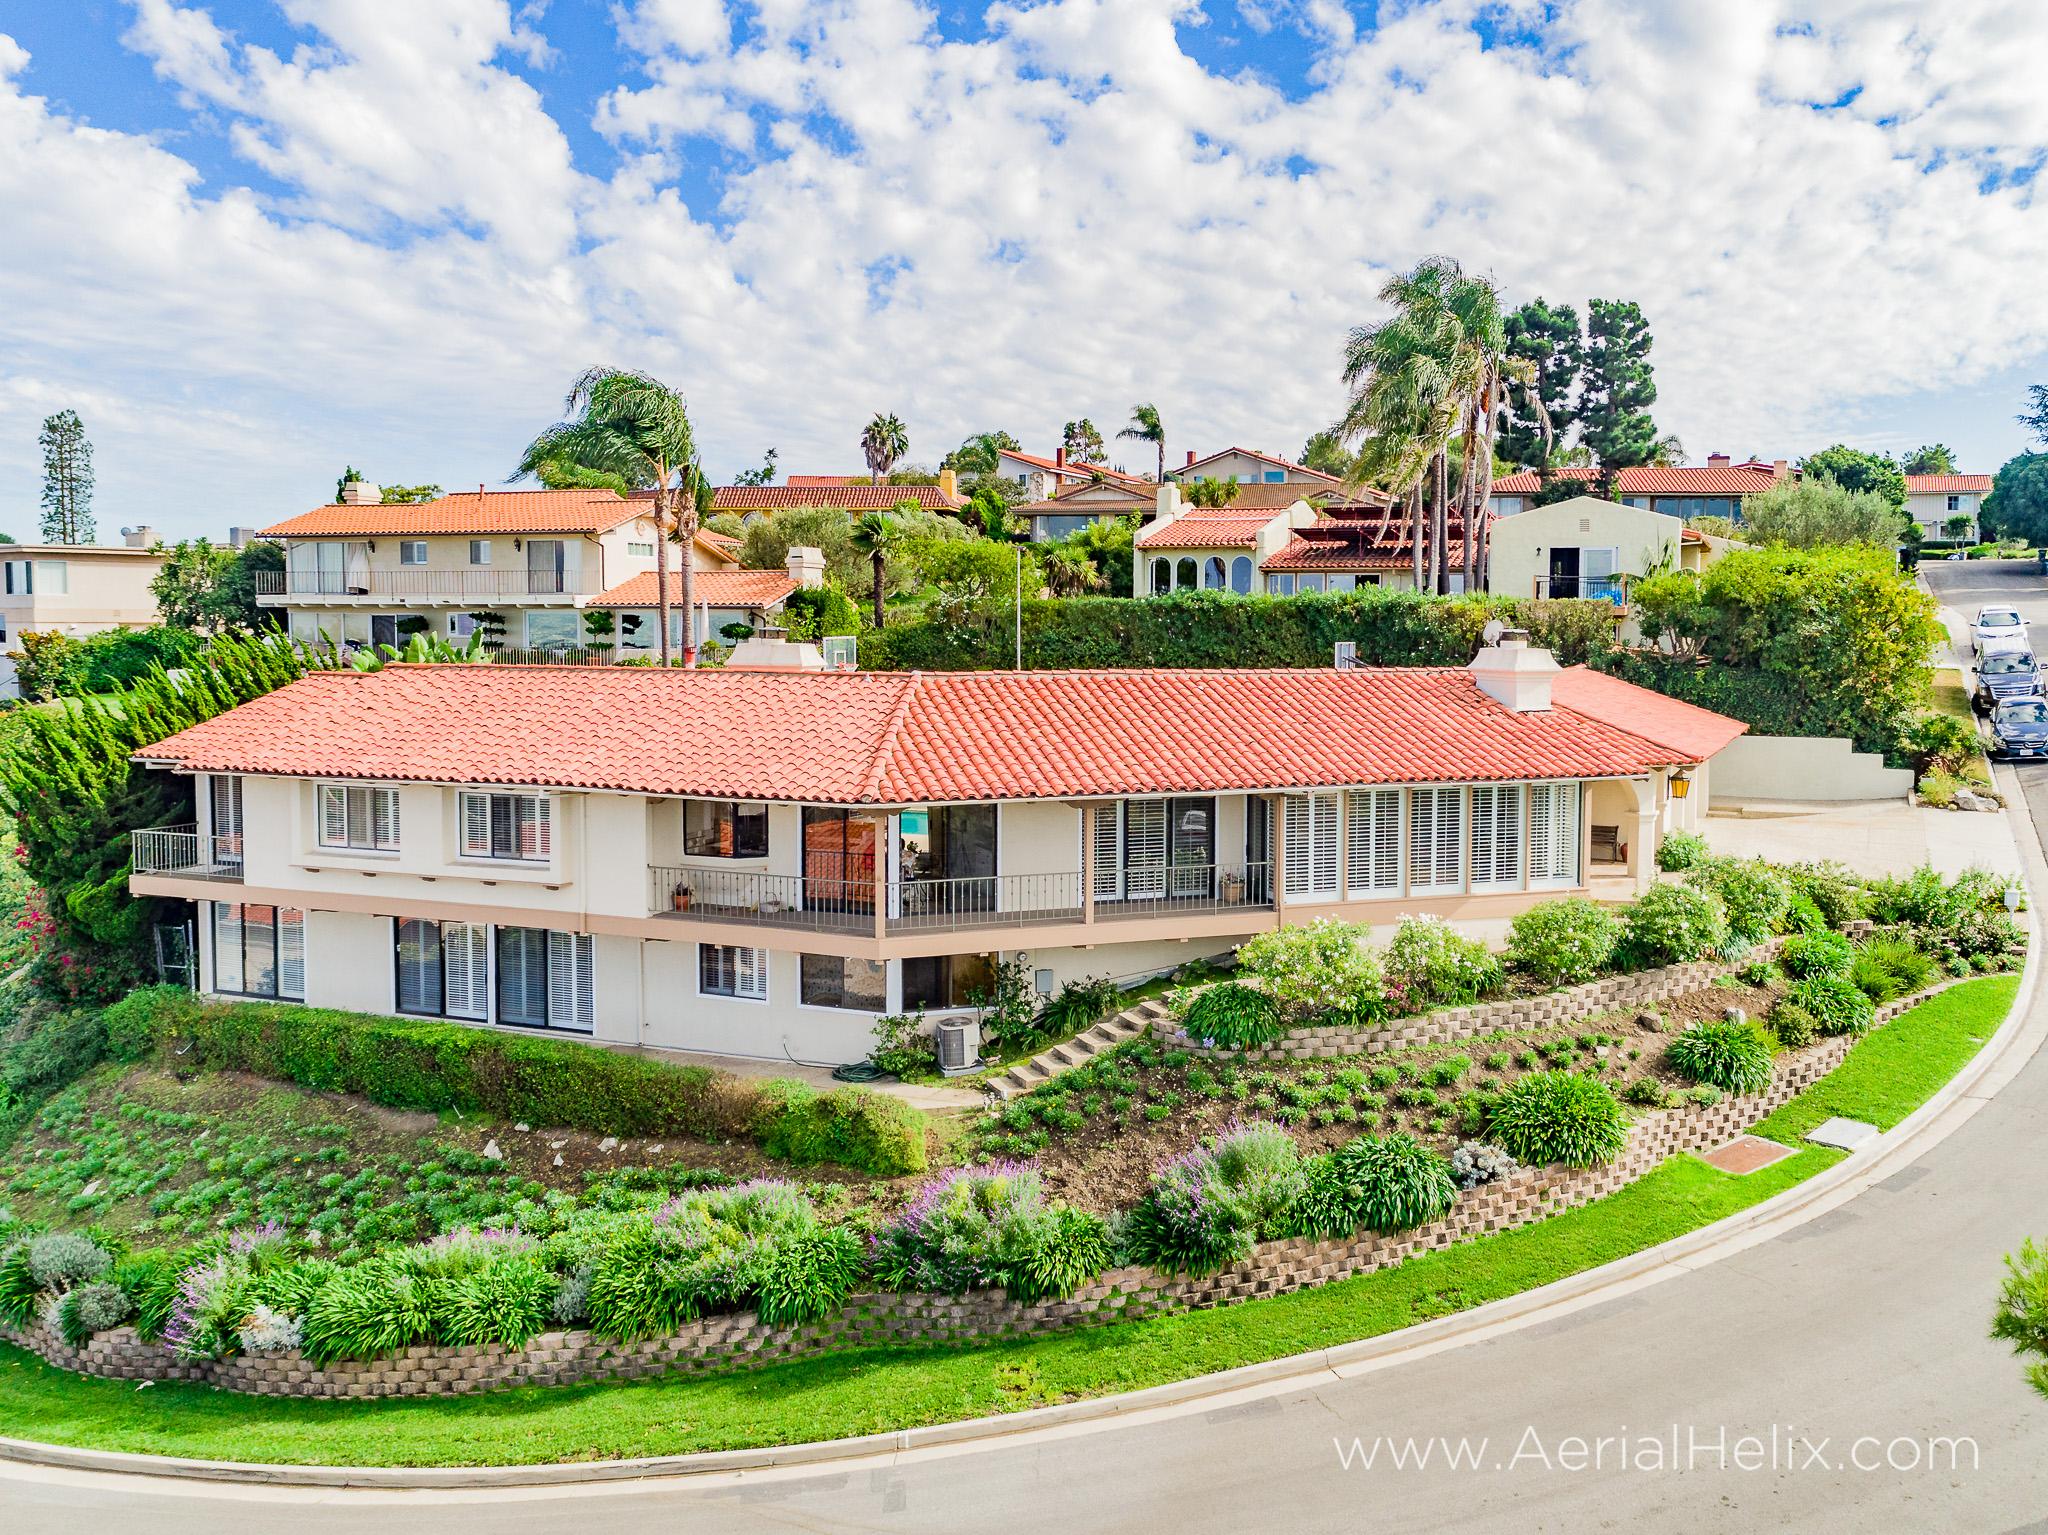 Woodfern Drive - HELIX Real Estate Aerial Photographer-11.jpg